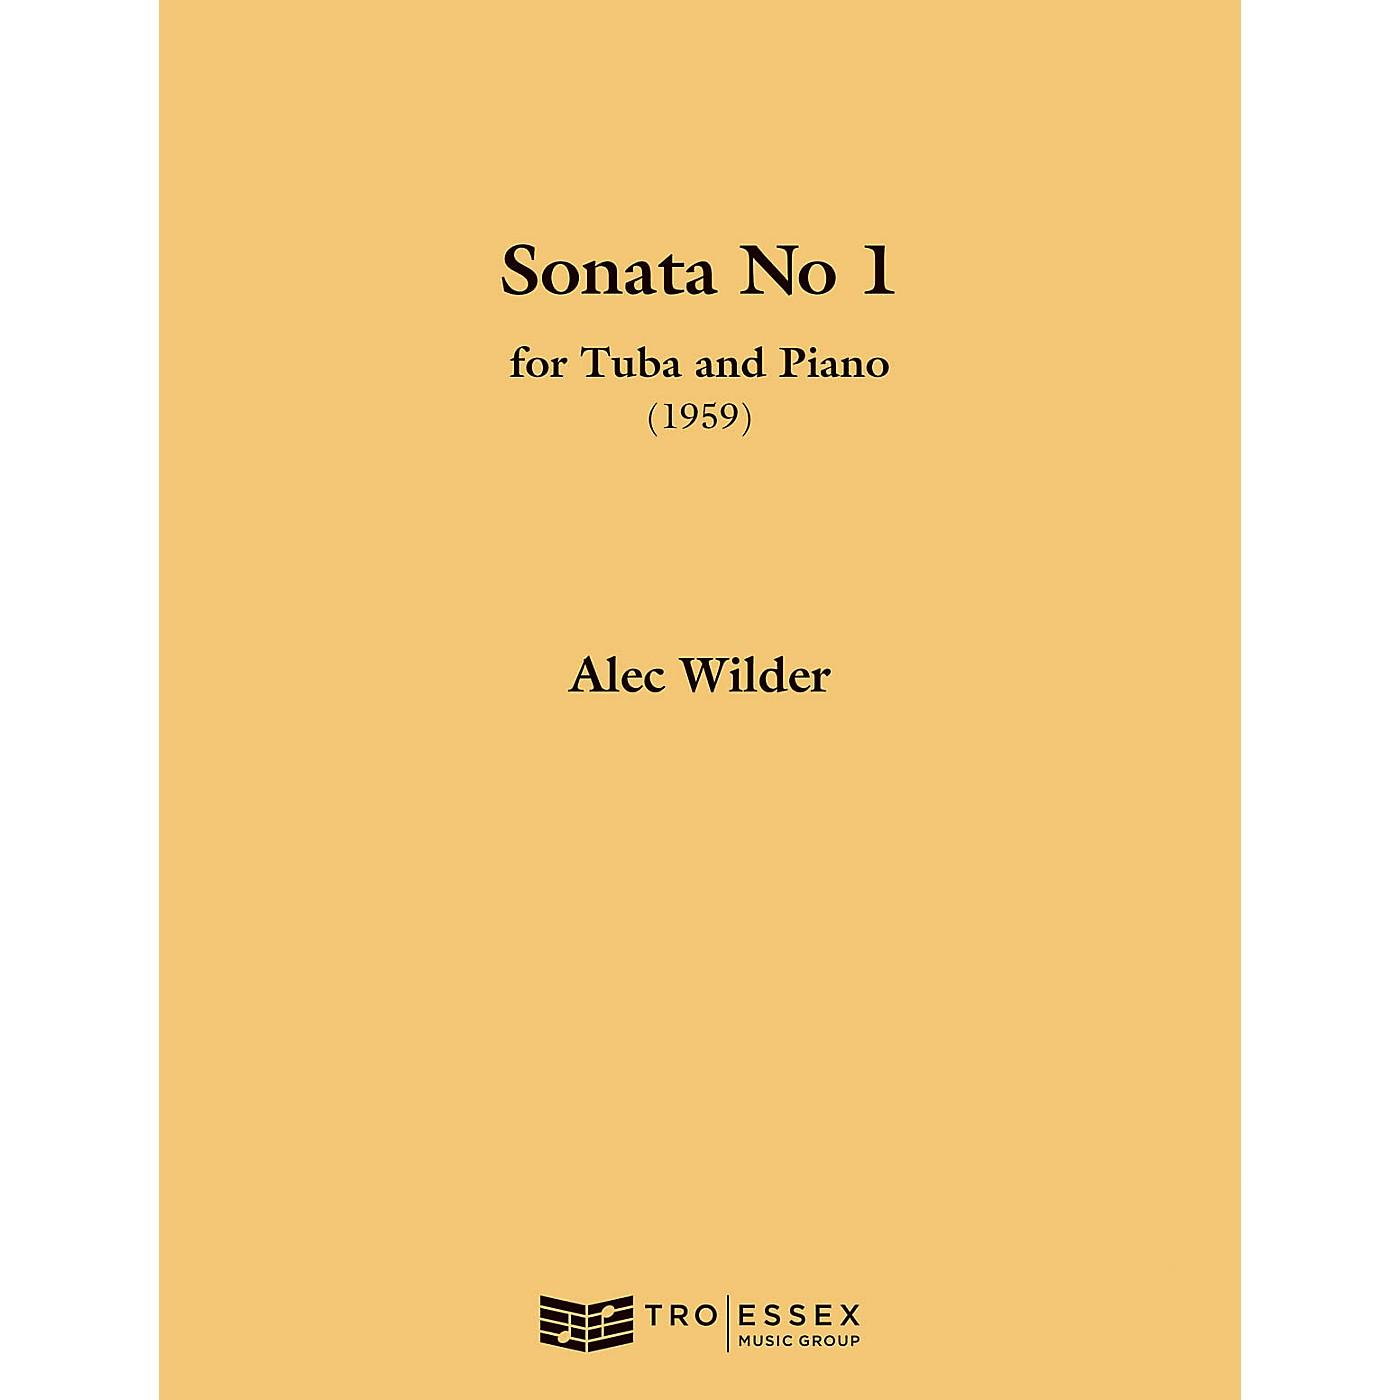 TRO ESSEX Music Group Sonata for Tuba and Piano (1959) (Tuba (B.C.)) Richmond Music ¯ Instrumental Series by Alec Wilder thumbnail